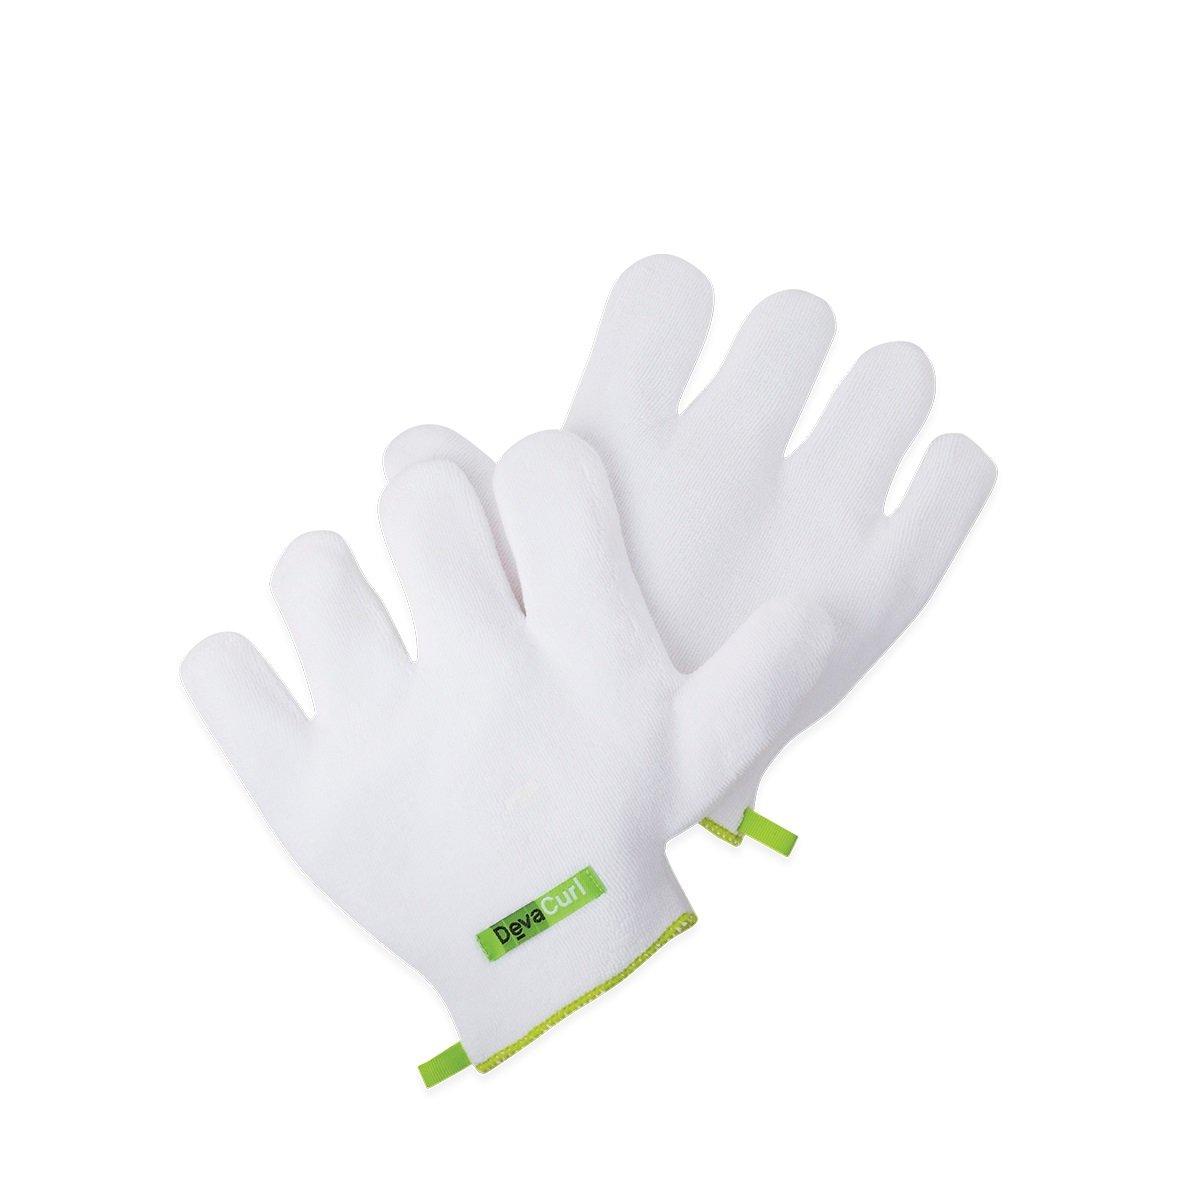 DevaCurl DevaGloves, Anti-Frizz Microfiber Hair Drying Gloves